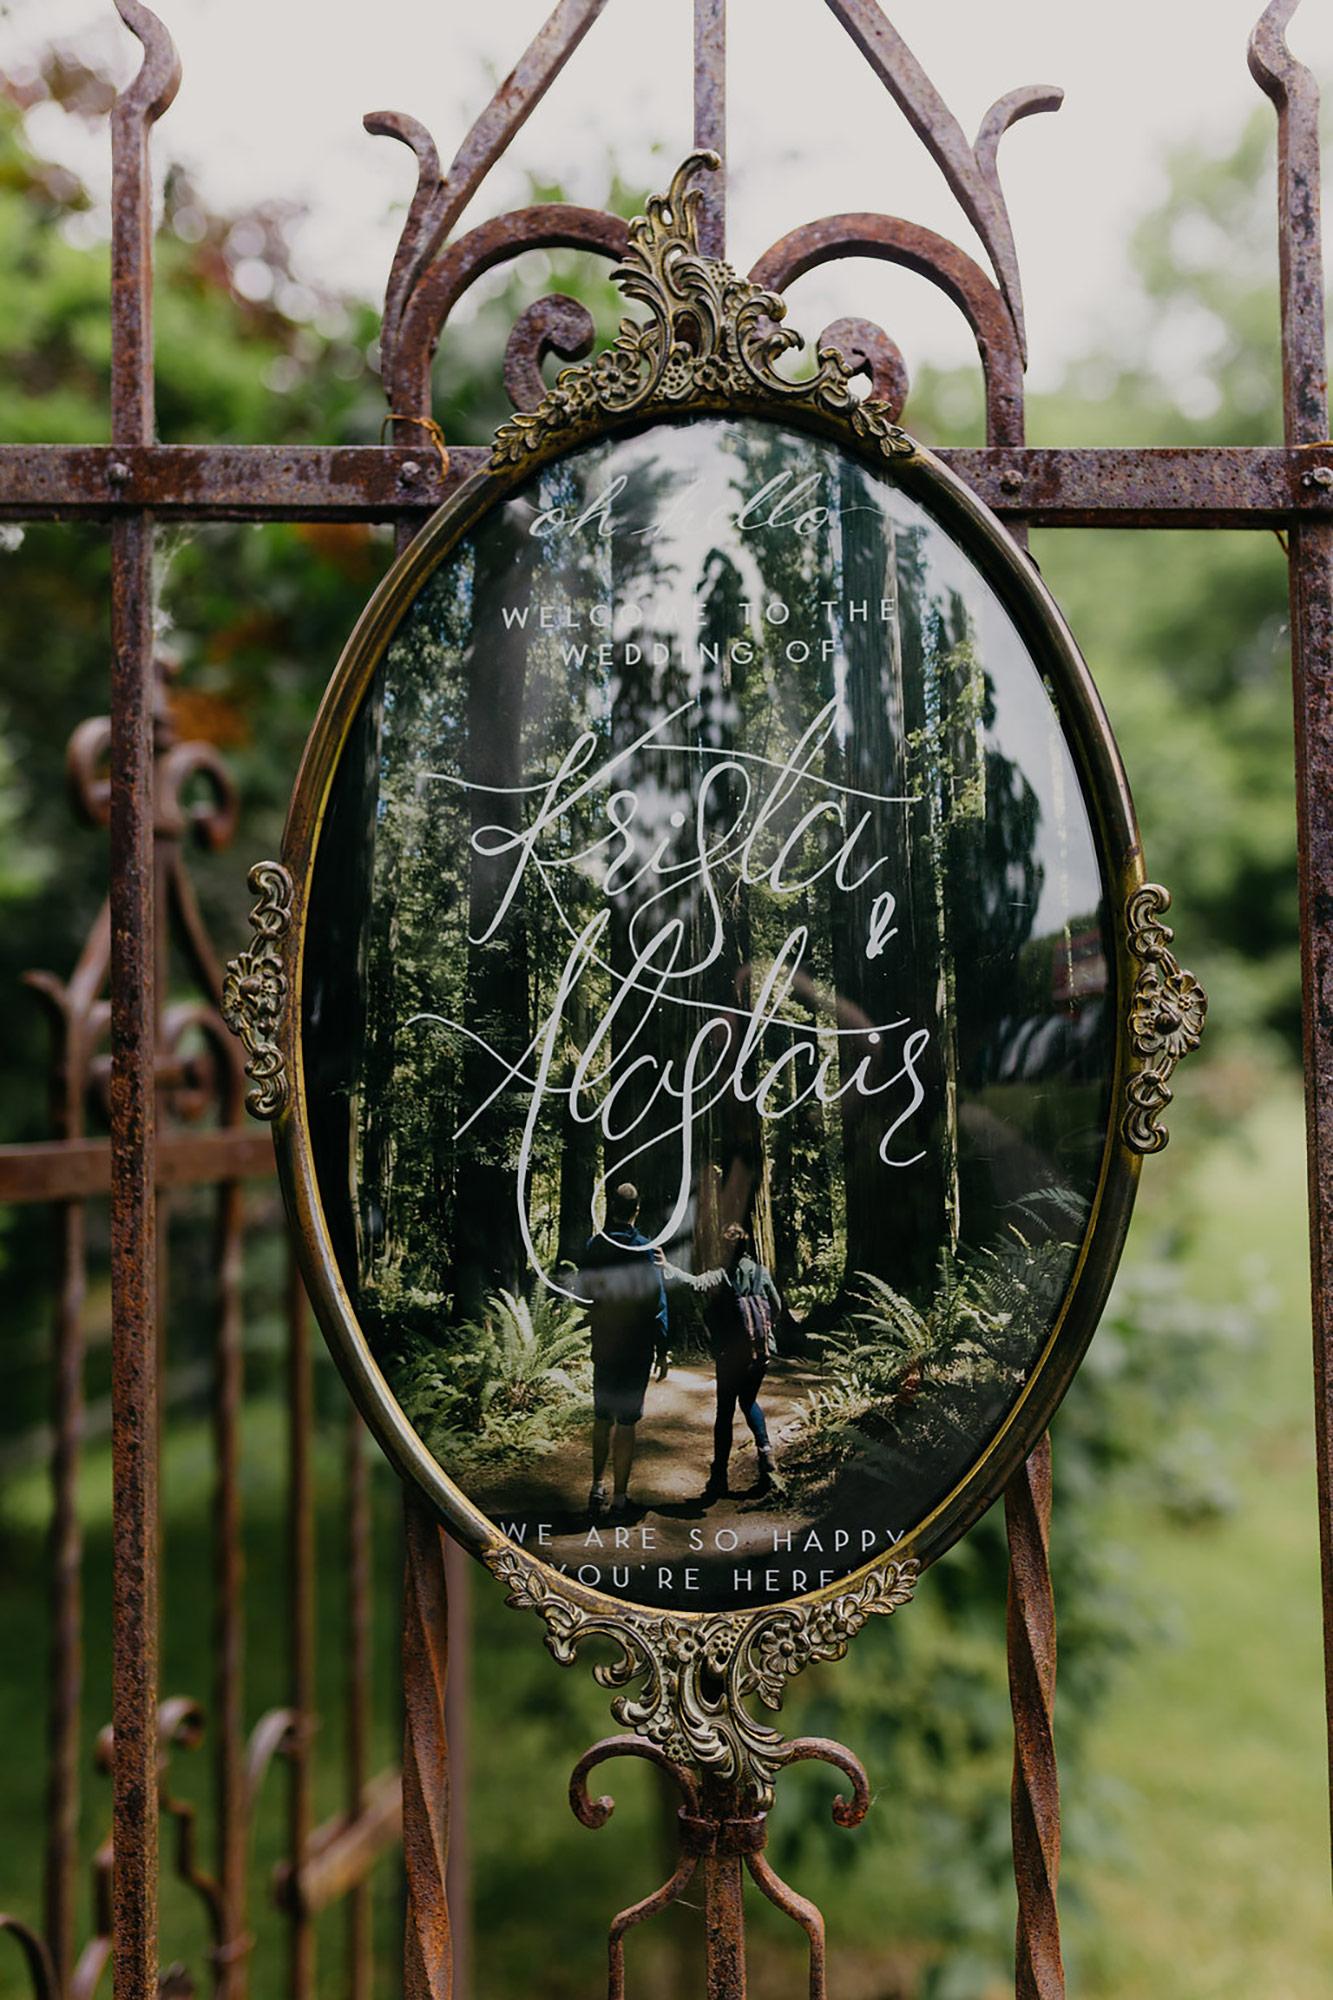 Kurtz-Orchards-Wedding-Niagara-wedding-Vineyard-Bride-Photography-by-Kayla-Rocca-014.JPG